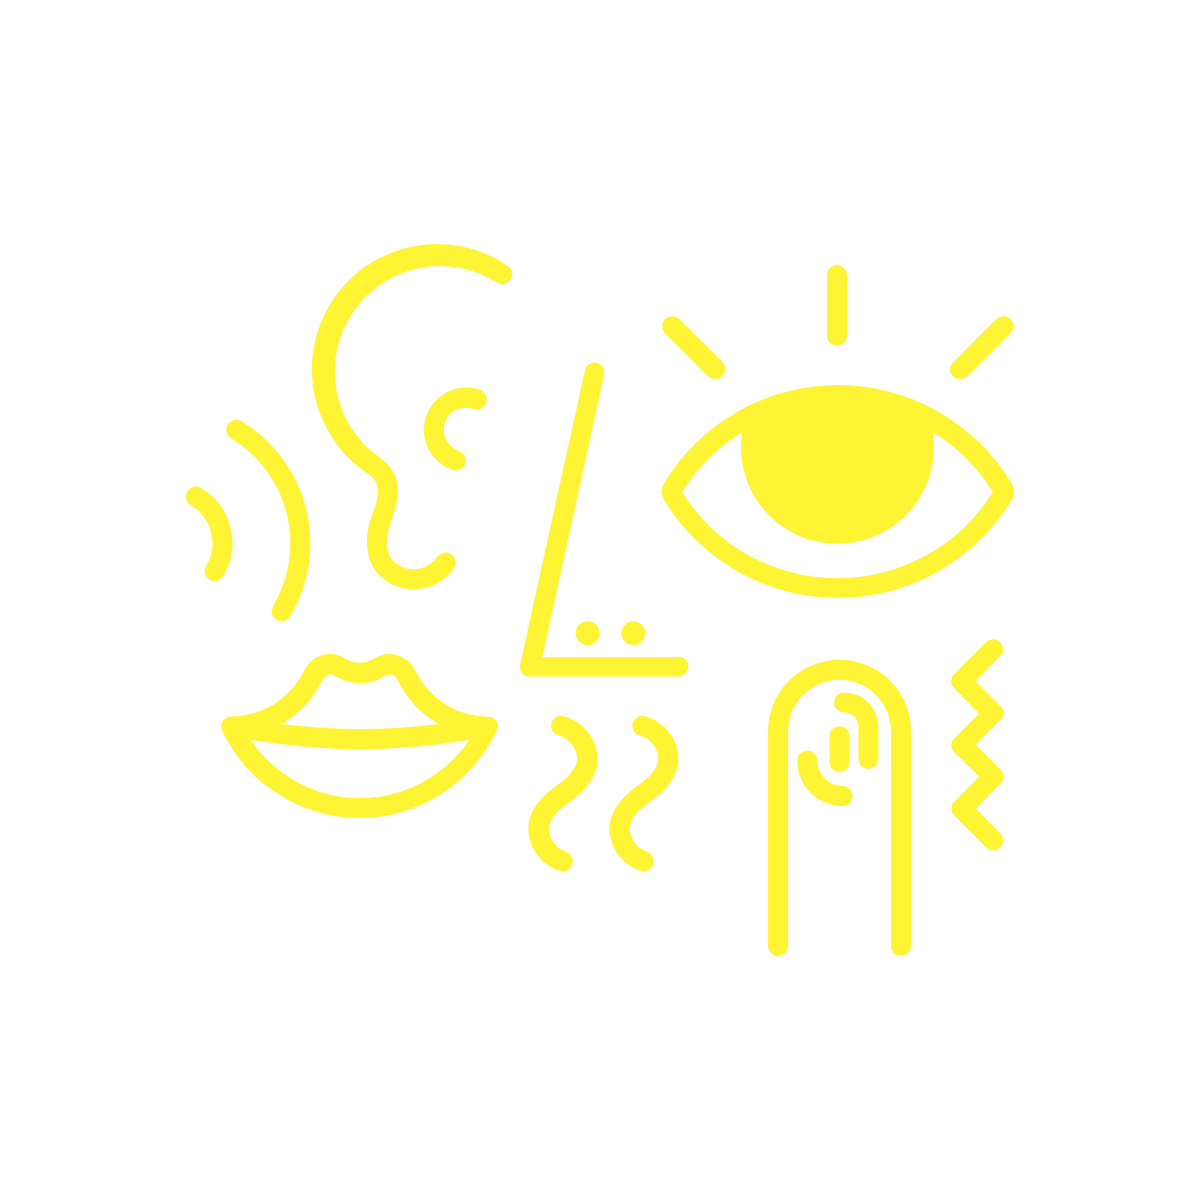 Picture representing the 5 senses